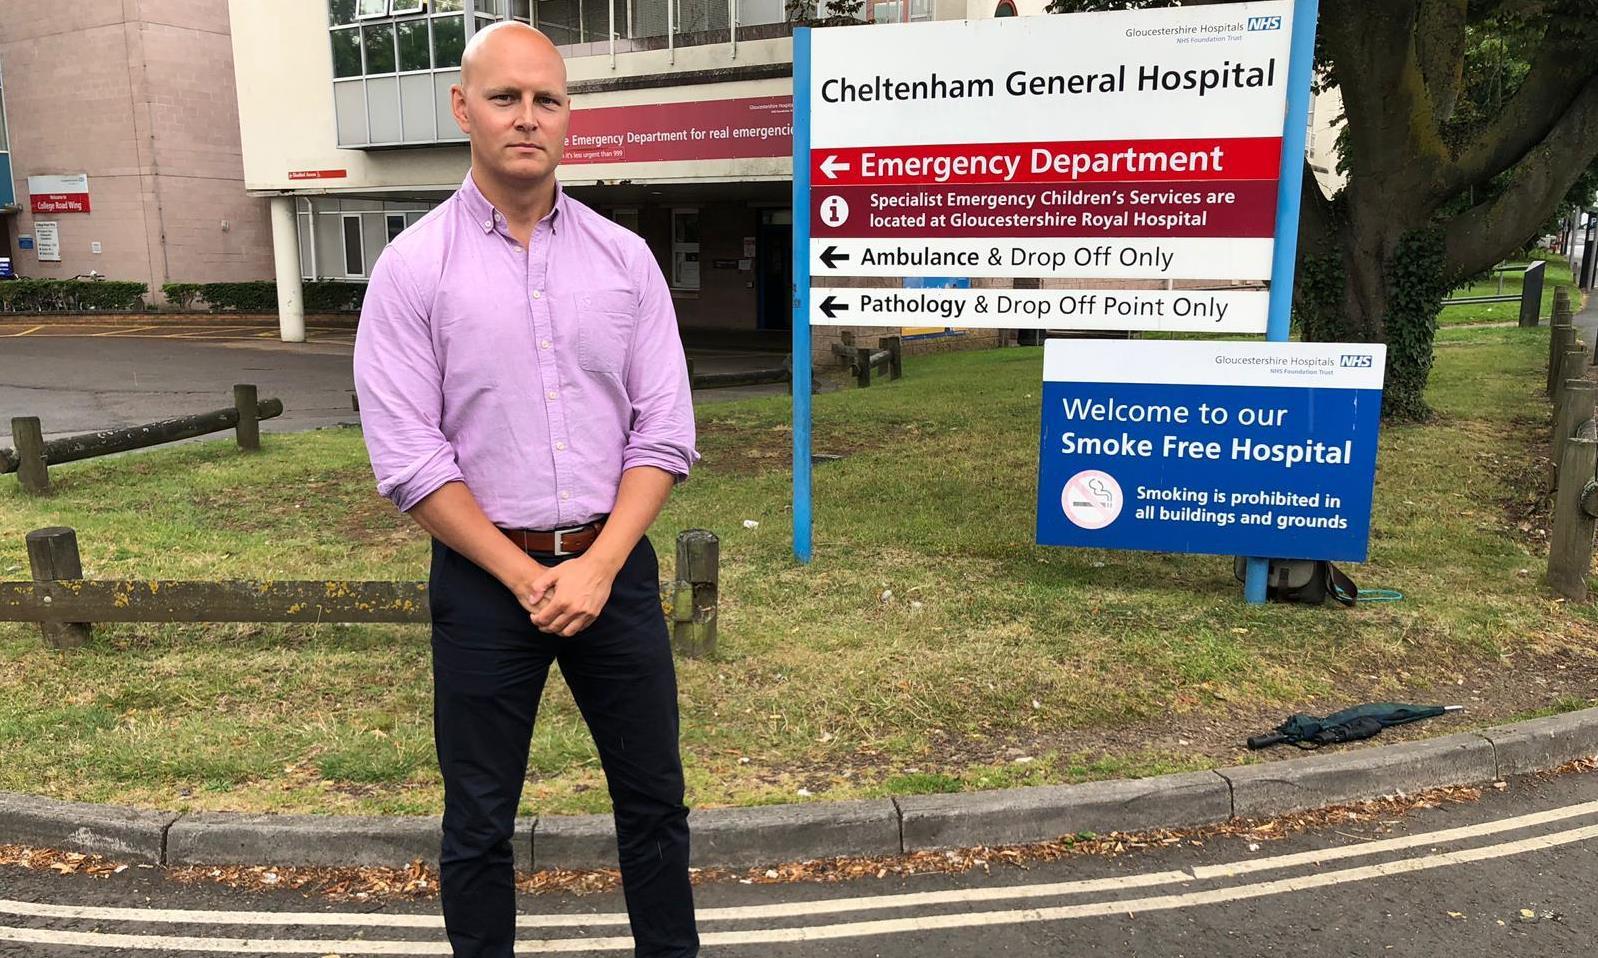 Update on the future of Cheltenham General Hospital